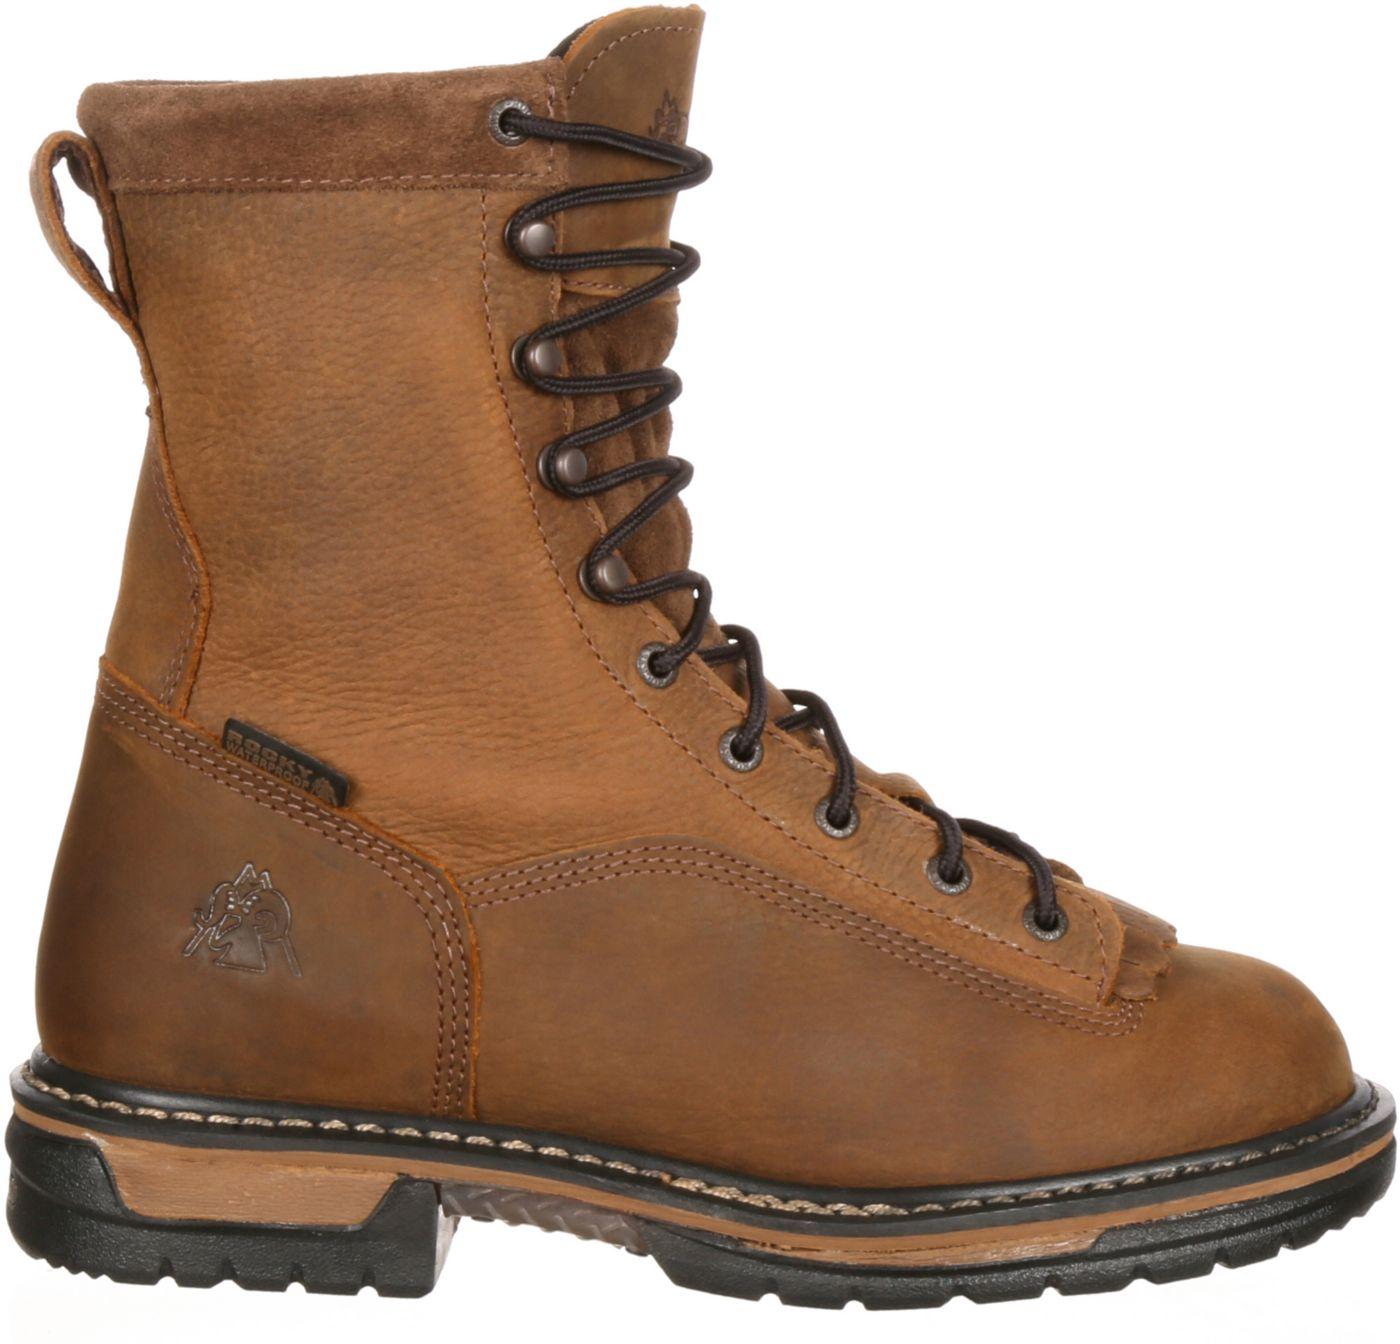 "Rocky Men's IronClad 9"" Waterproof Steel Toe Work Boots"